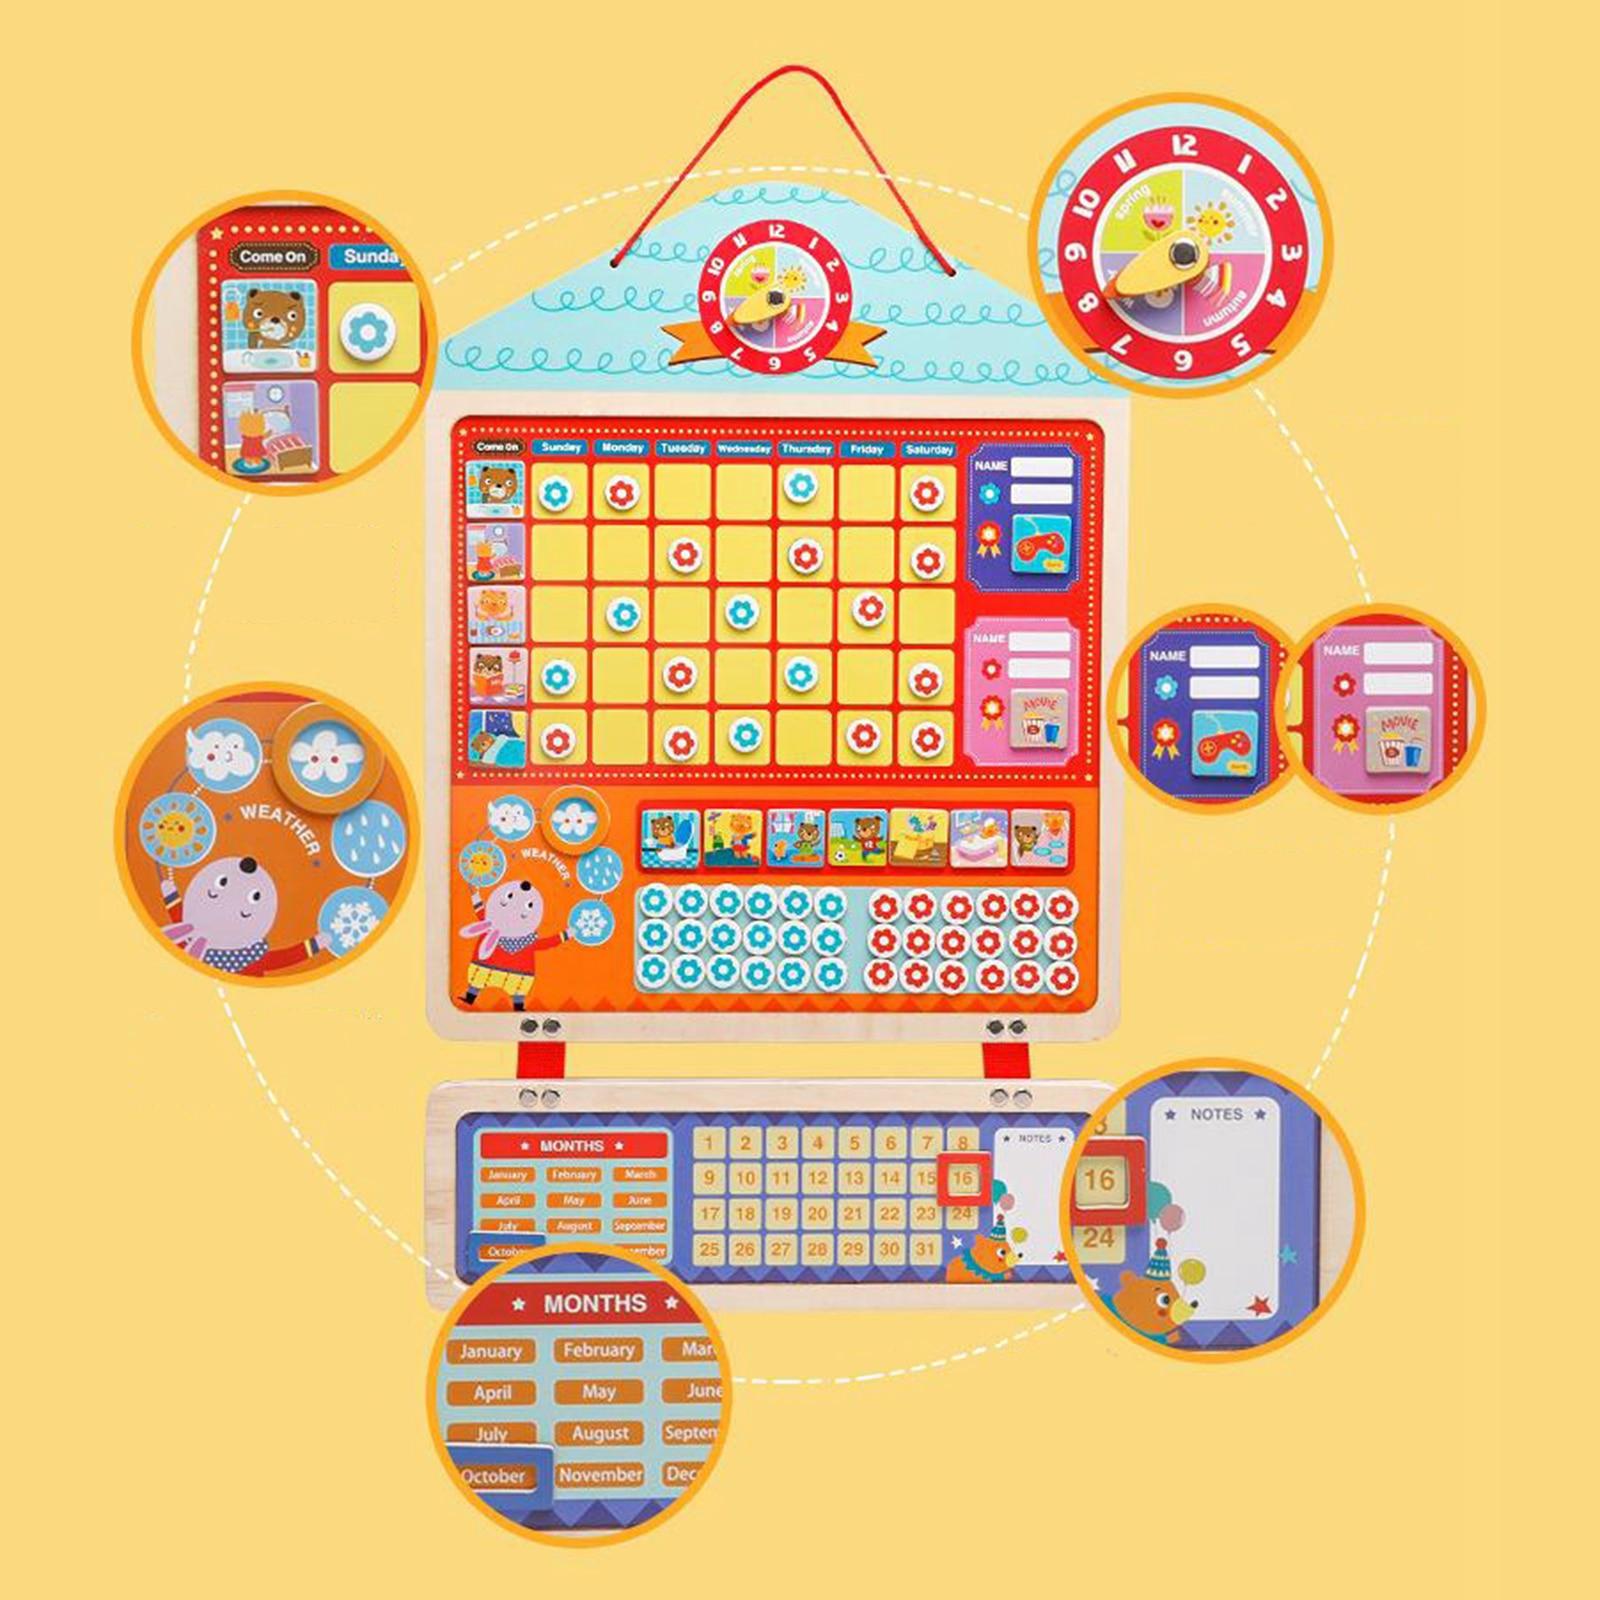 My Magnetic Calendar Reward Sticker Time Sheet Learning Plan Good Habits Self Discipline Kids Schedule Preschool Toys